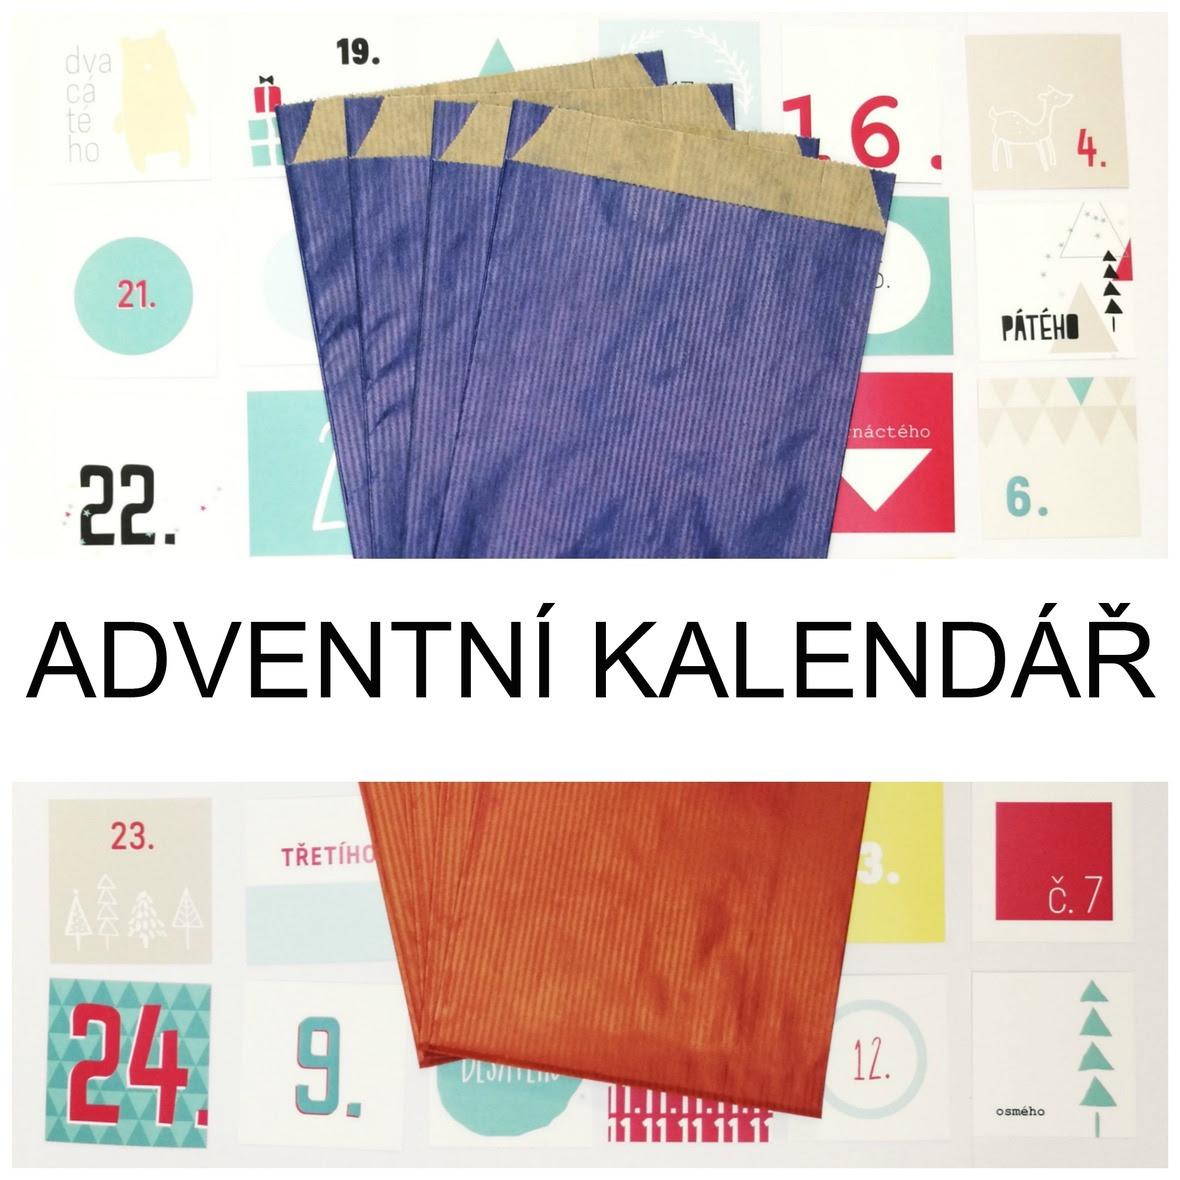 PicMonkey Image adventni kalendar